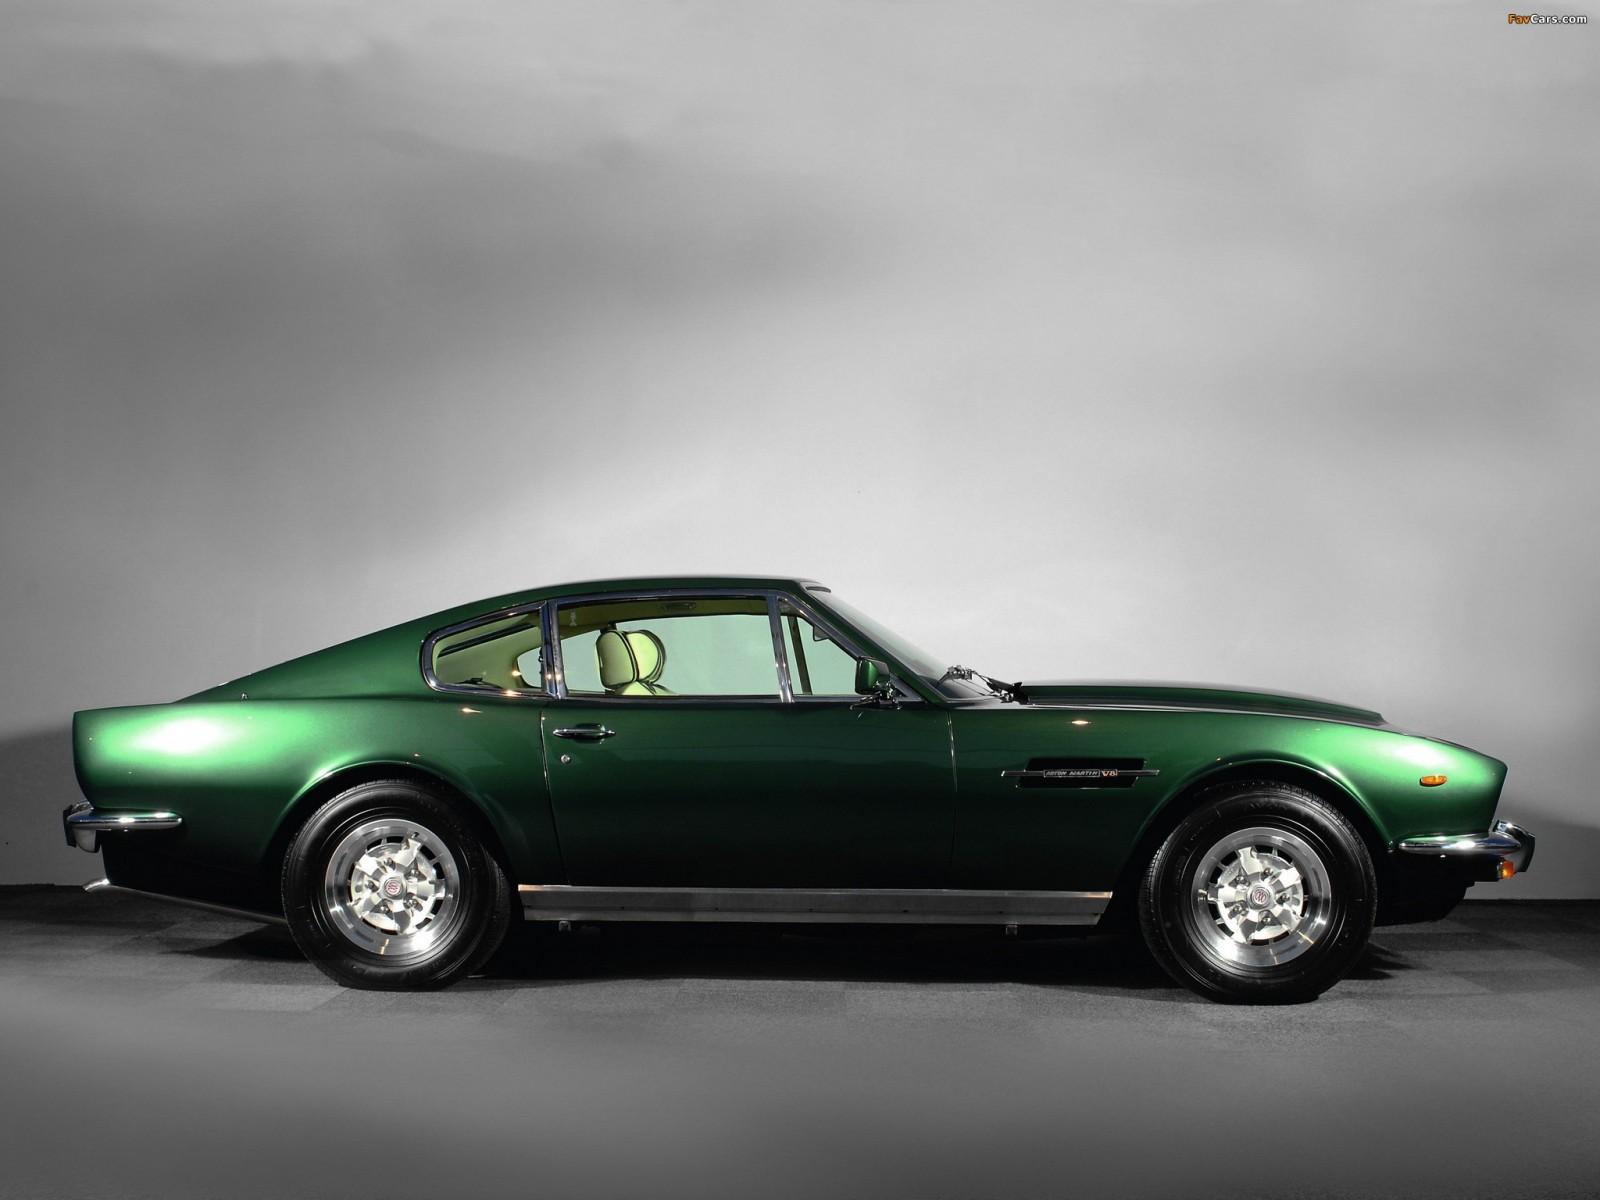 James Bond Car Wallpaper 1972 Ford Mustang Sprint Package